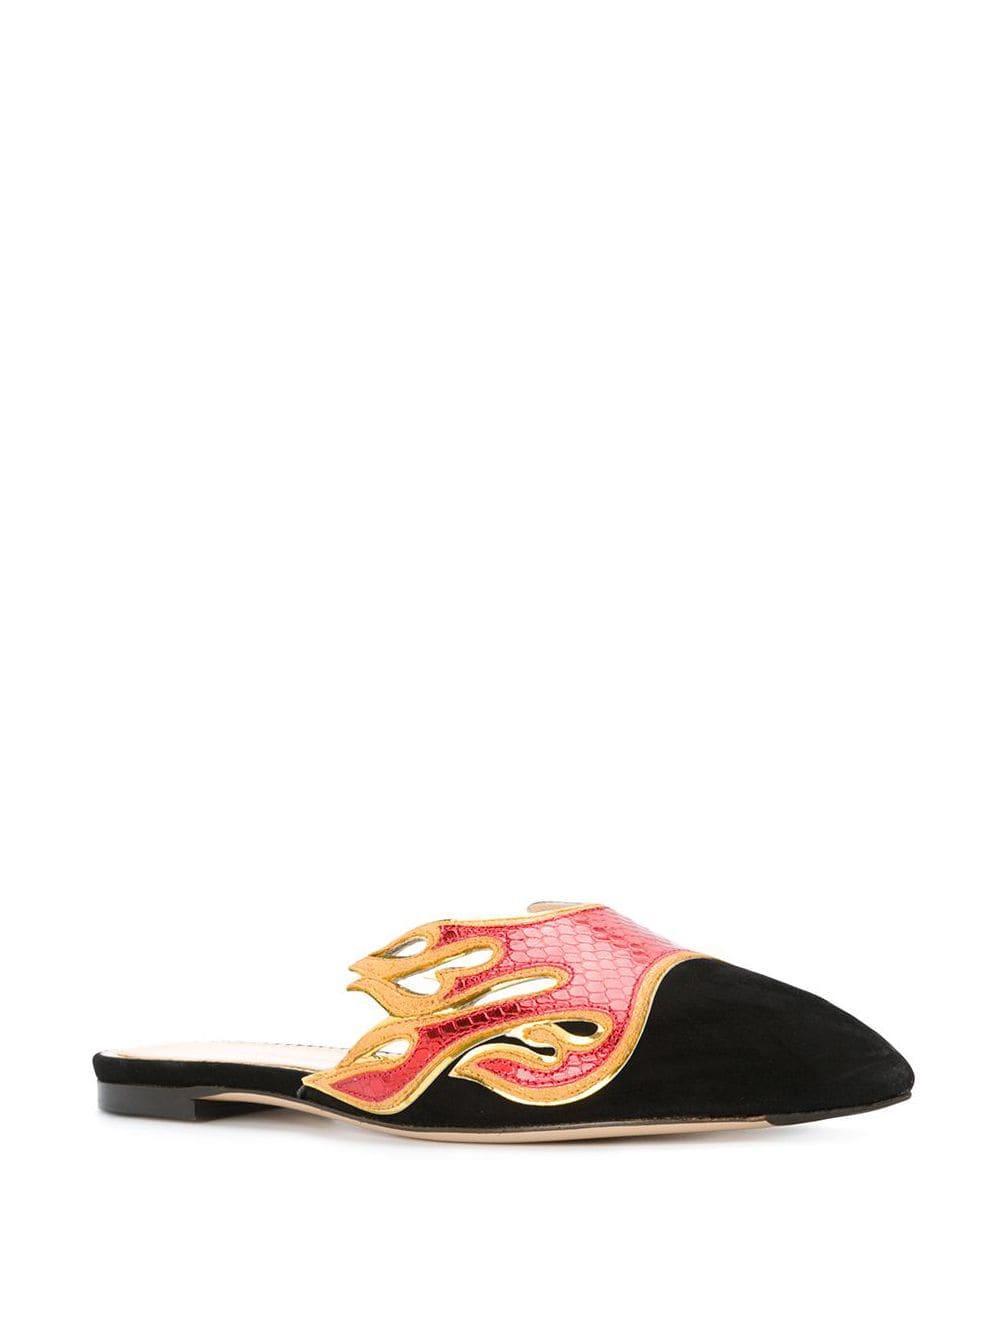 Mules Inferno estilo slippers Charlotte Olympia de Ante de color Rojo